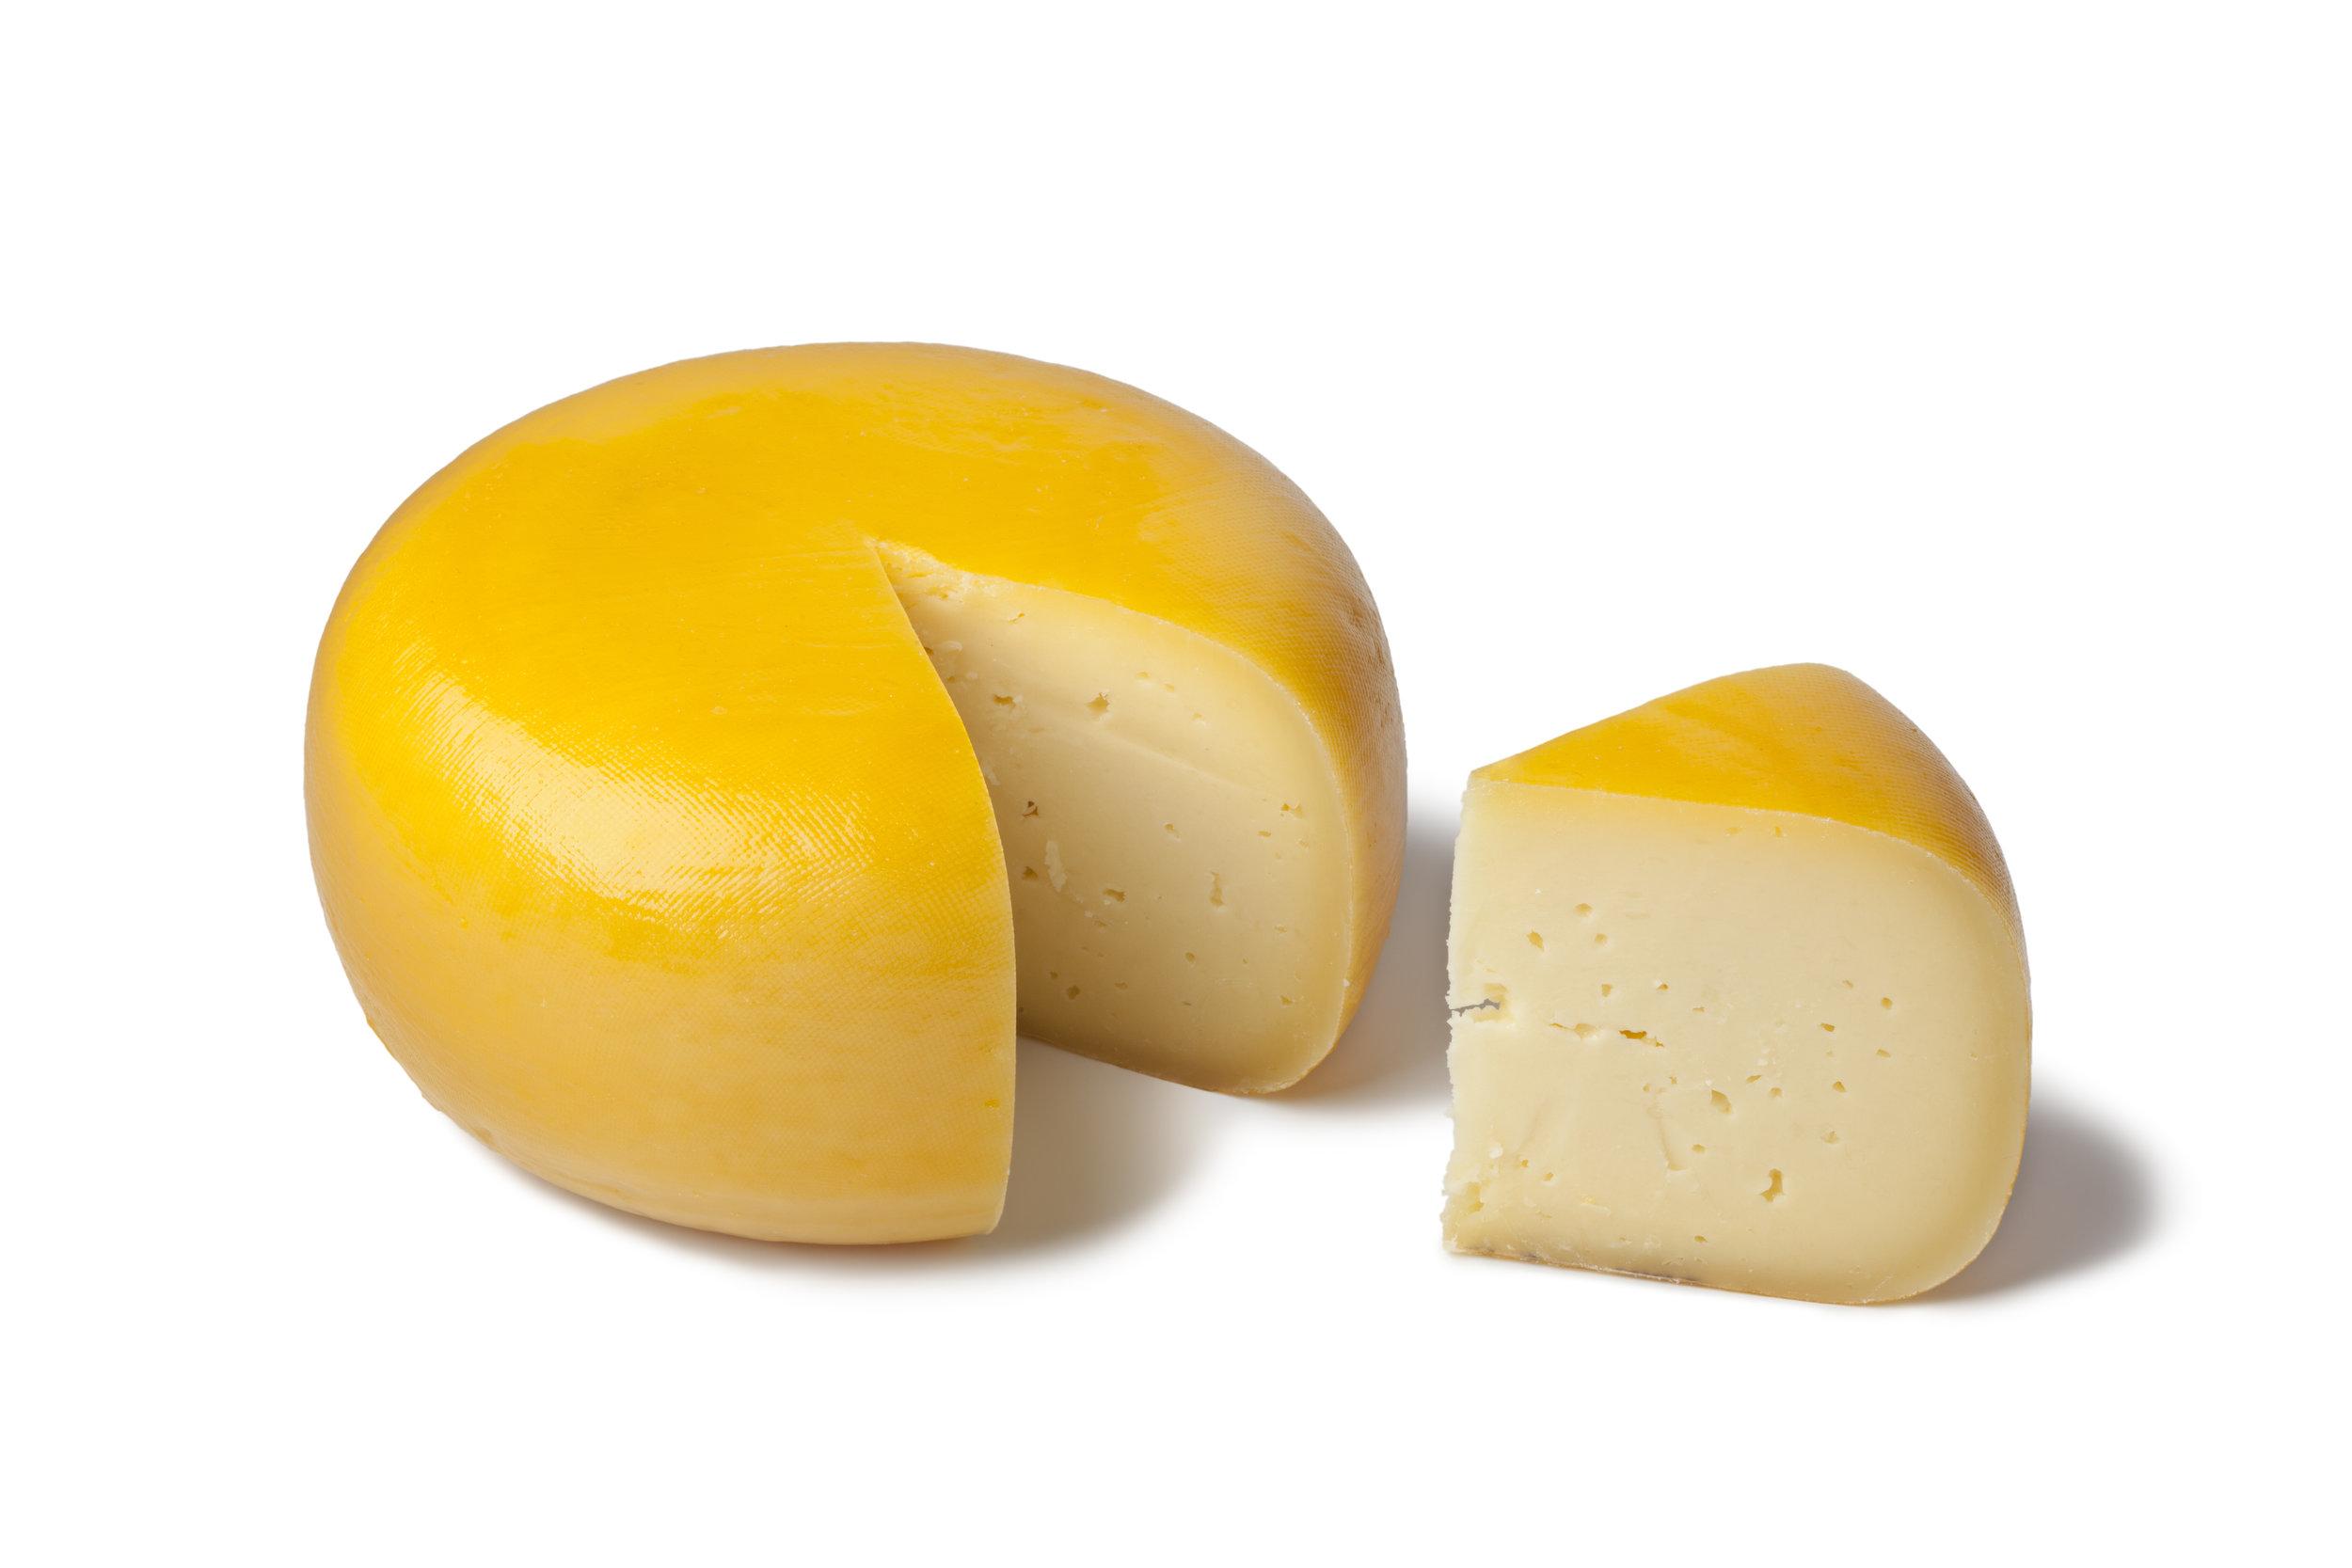 cheese is high in tyrosine